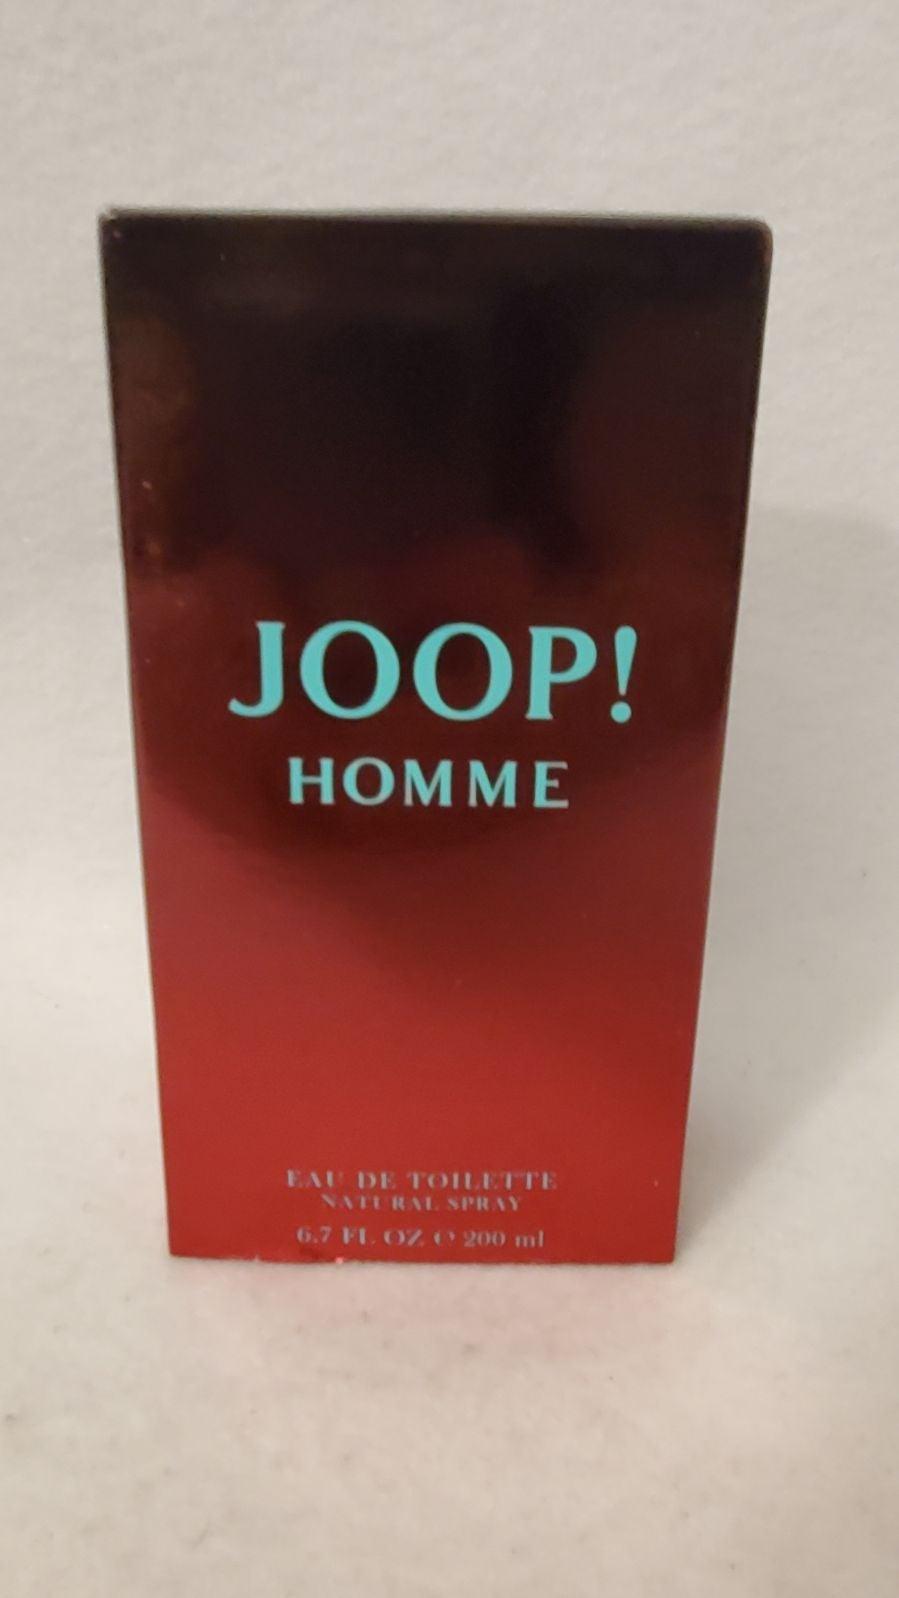 JOOP Homme cologne 6 .7